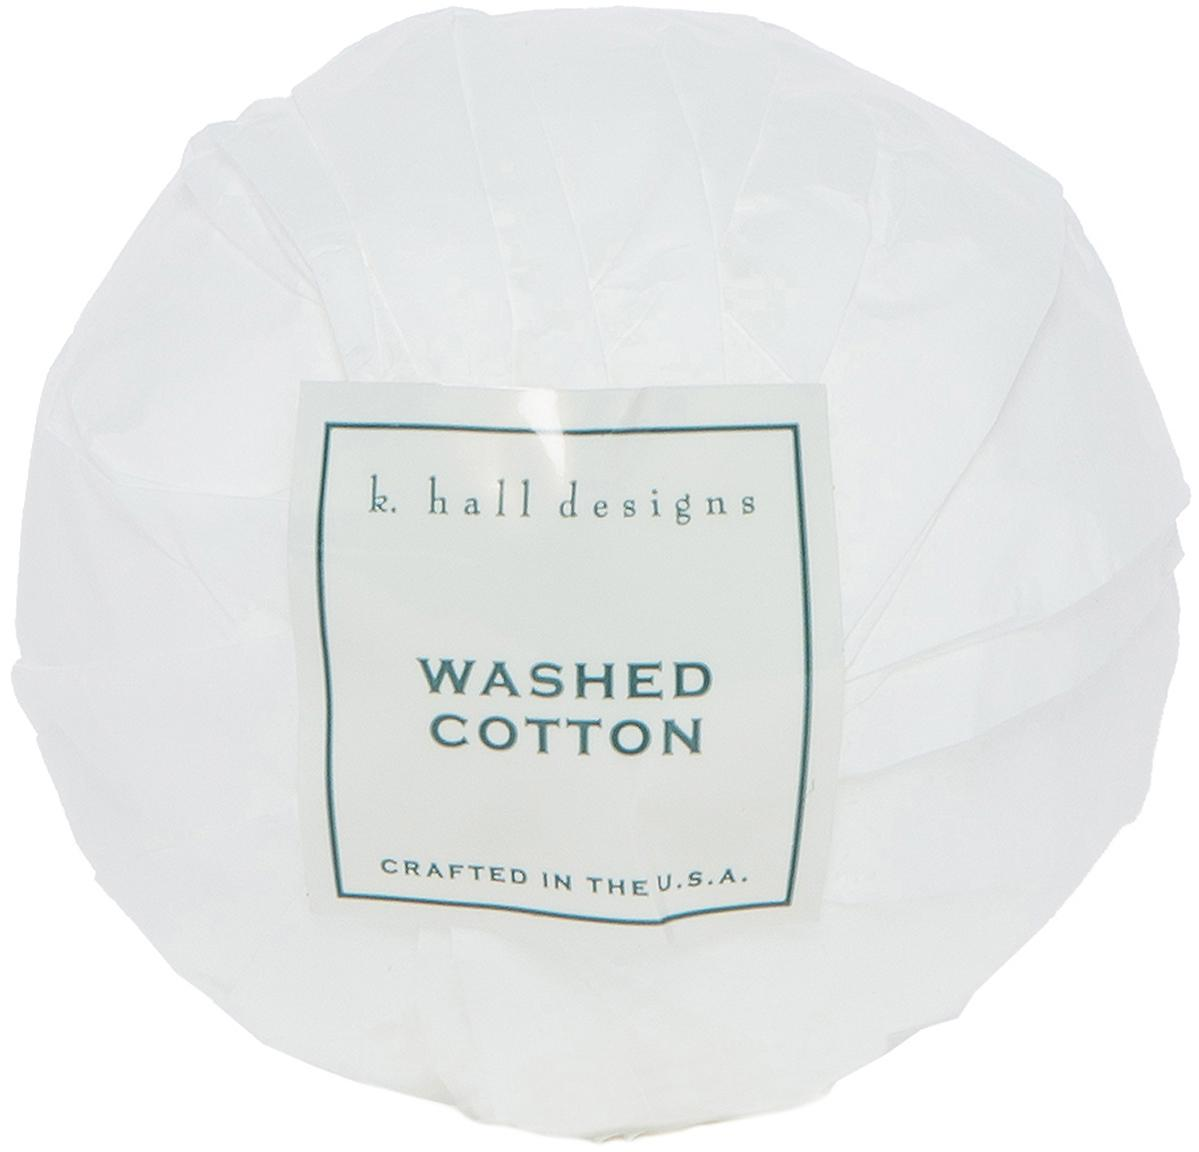 Badbruisbal Washed Cotton (lavendel & kamille), Wit, Ø 7 x H 7 cm